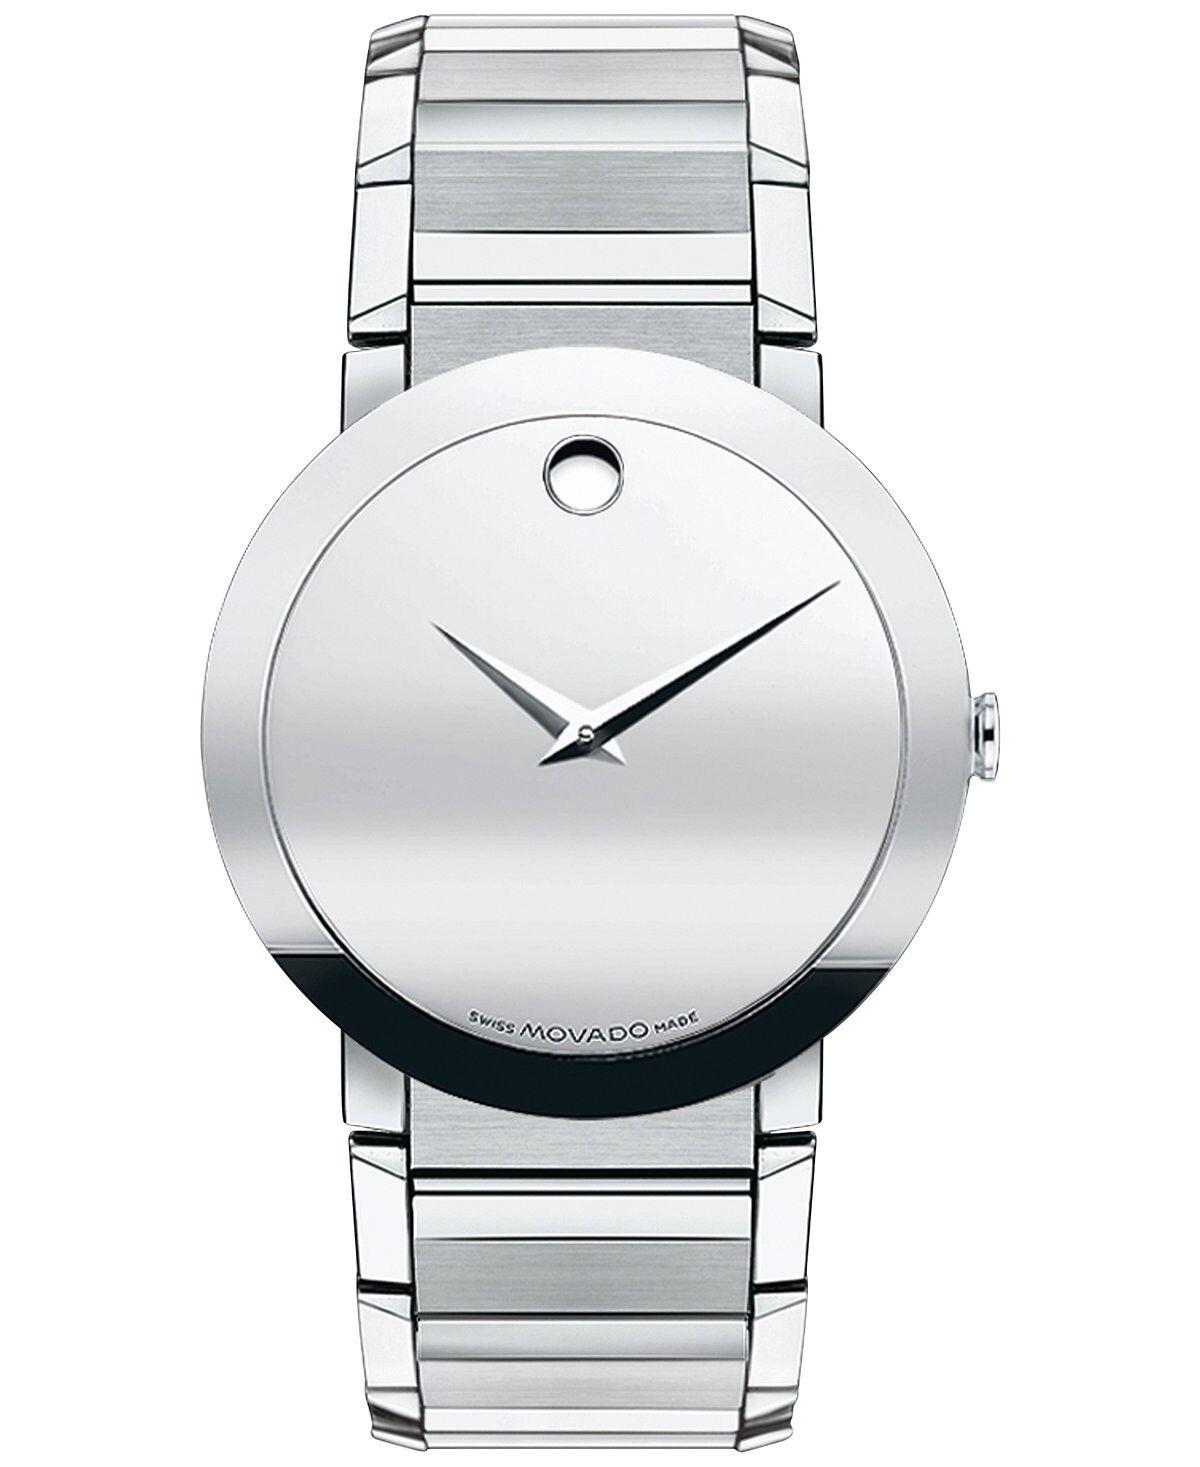 Movado Swiss Sapphire Stainless Steel Wrist Watch for Men